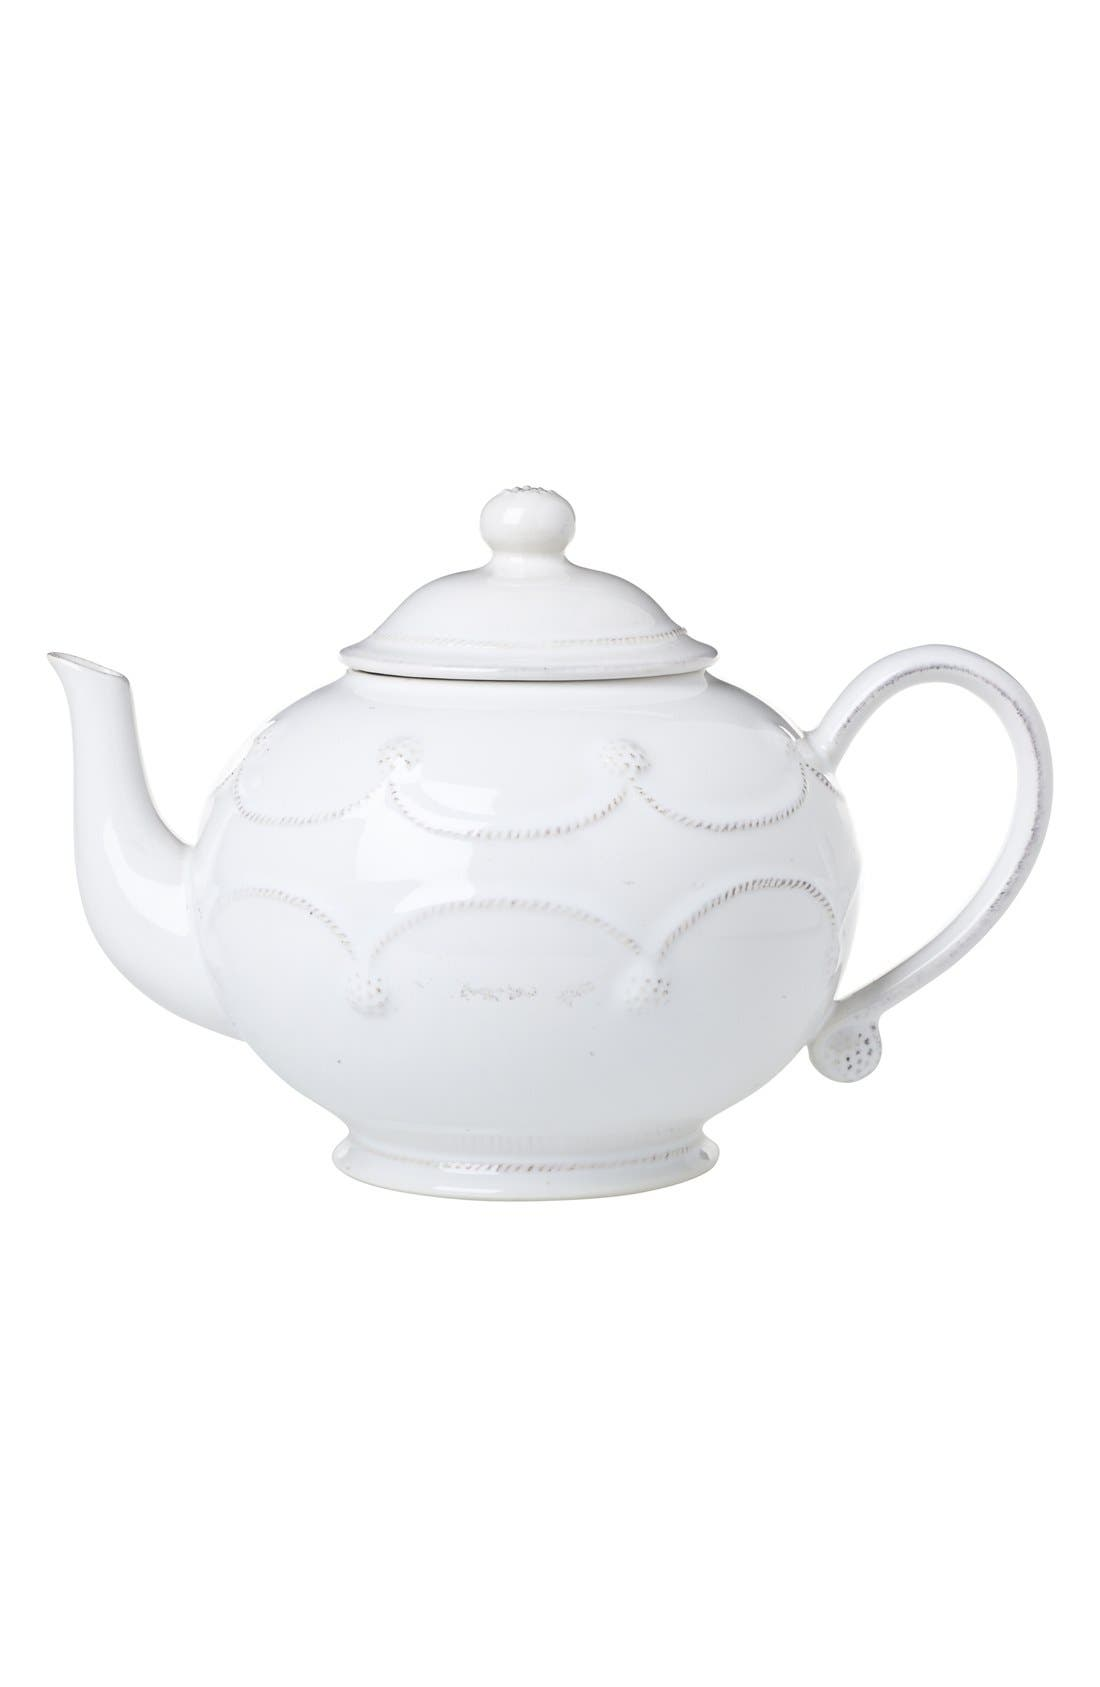 JULISKA 'Berry and Thread' Ceramic Teapot